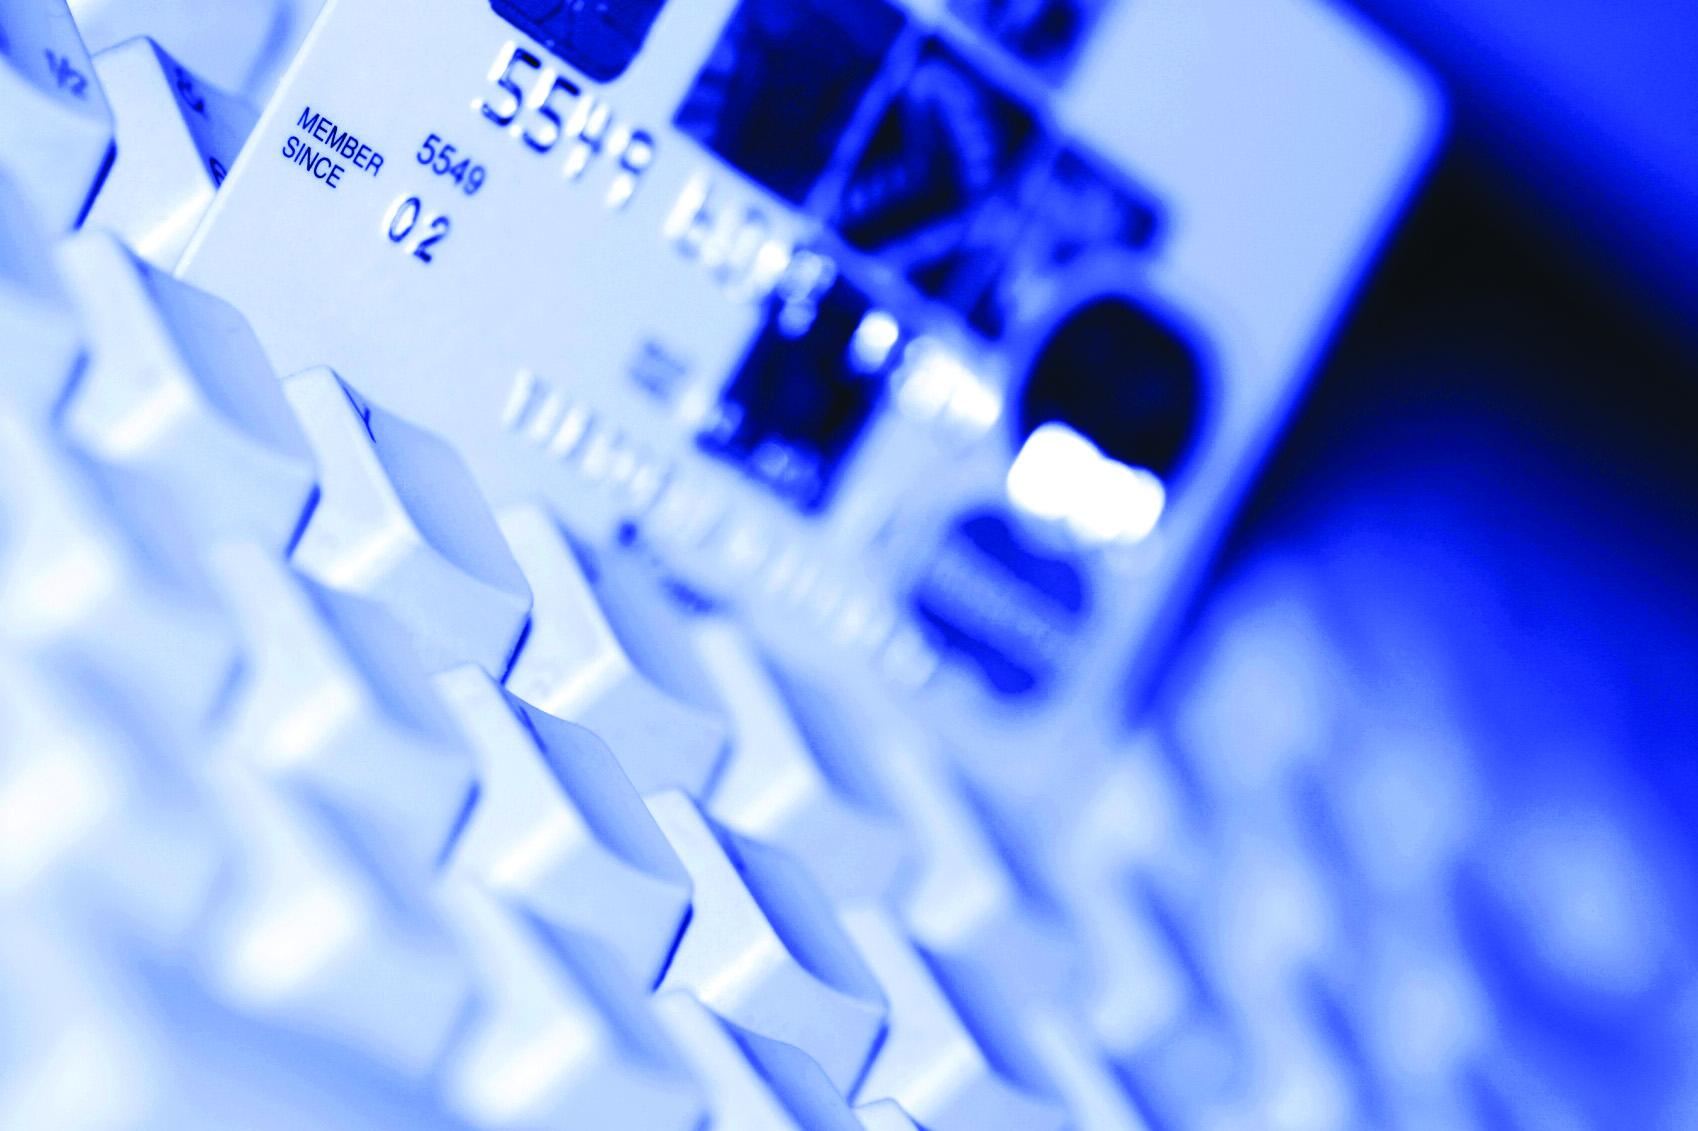 Sistec a implementat soluția de procesare a instrumentelor de debit PAID la Banca Transilvania